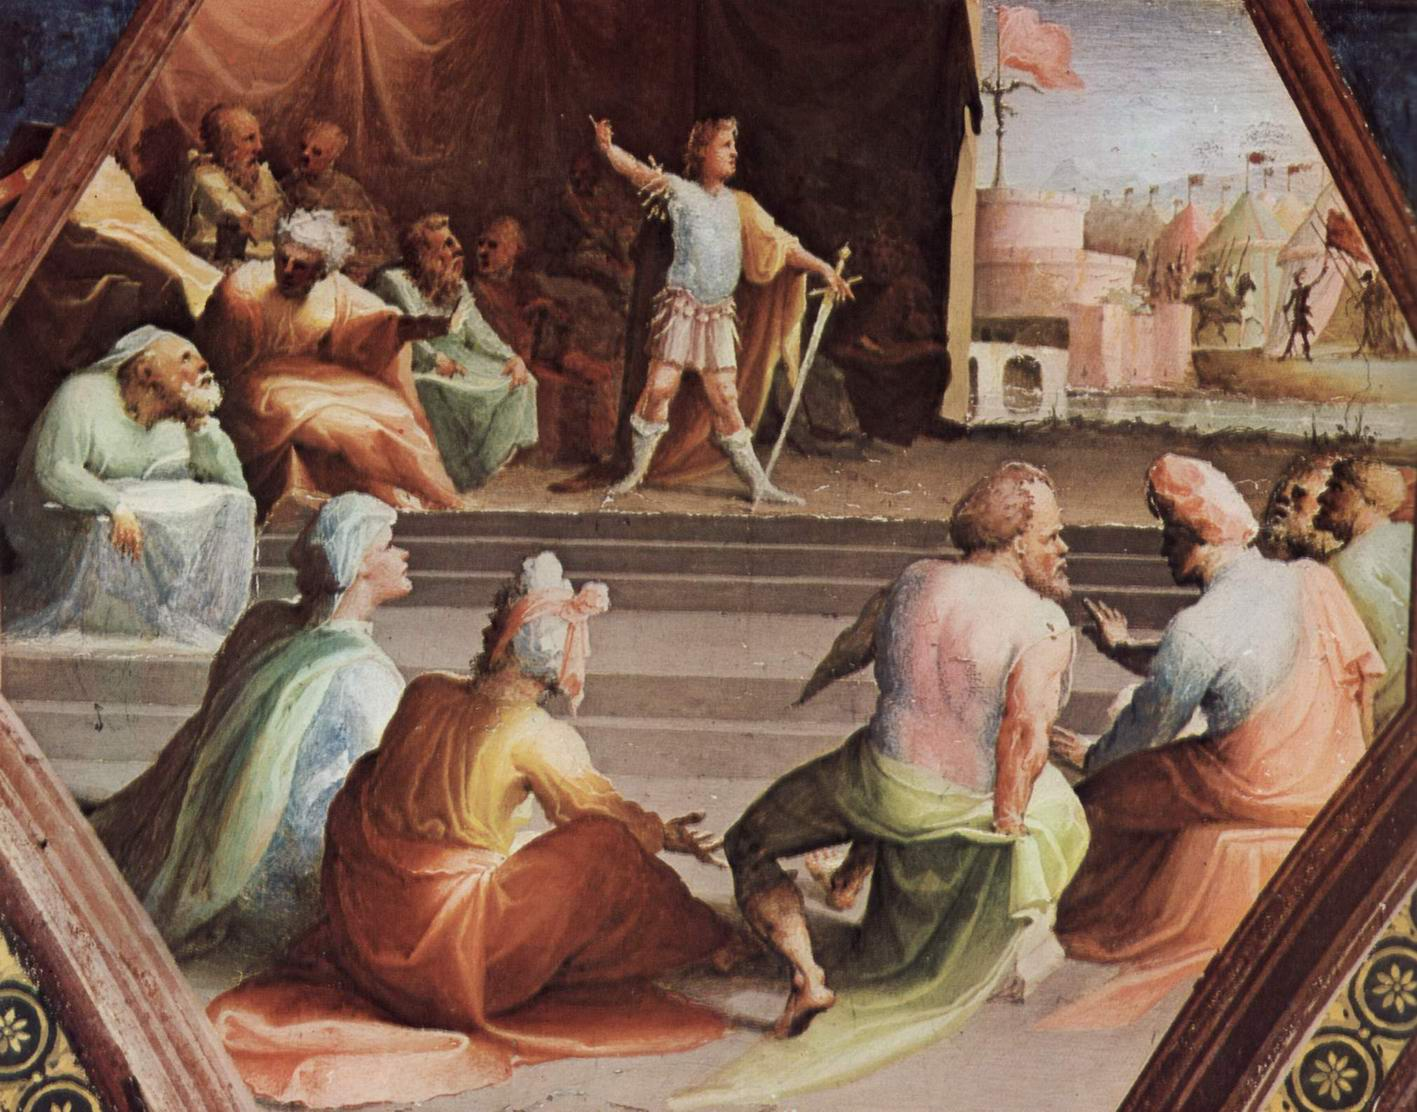 Фрески палаццо Бинди Сегарди, Сципион со своими солдатами, Беккафуми Доменико